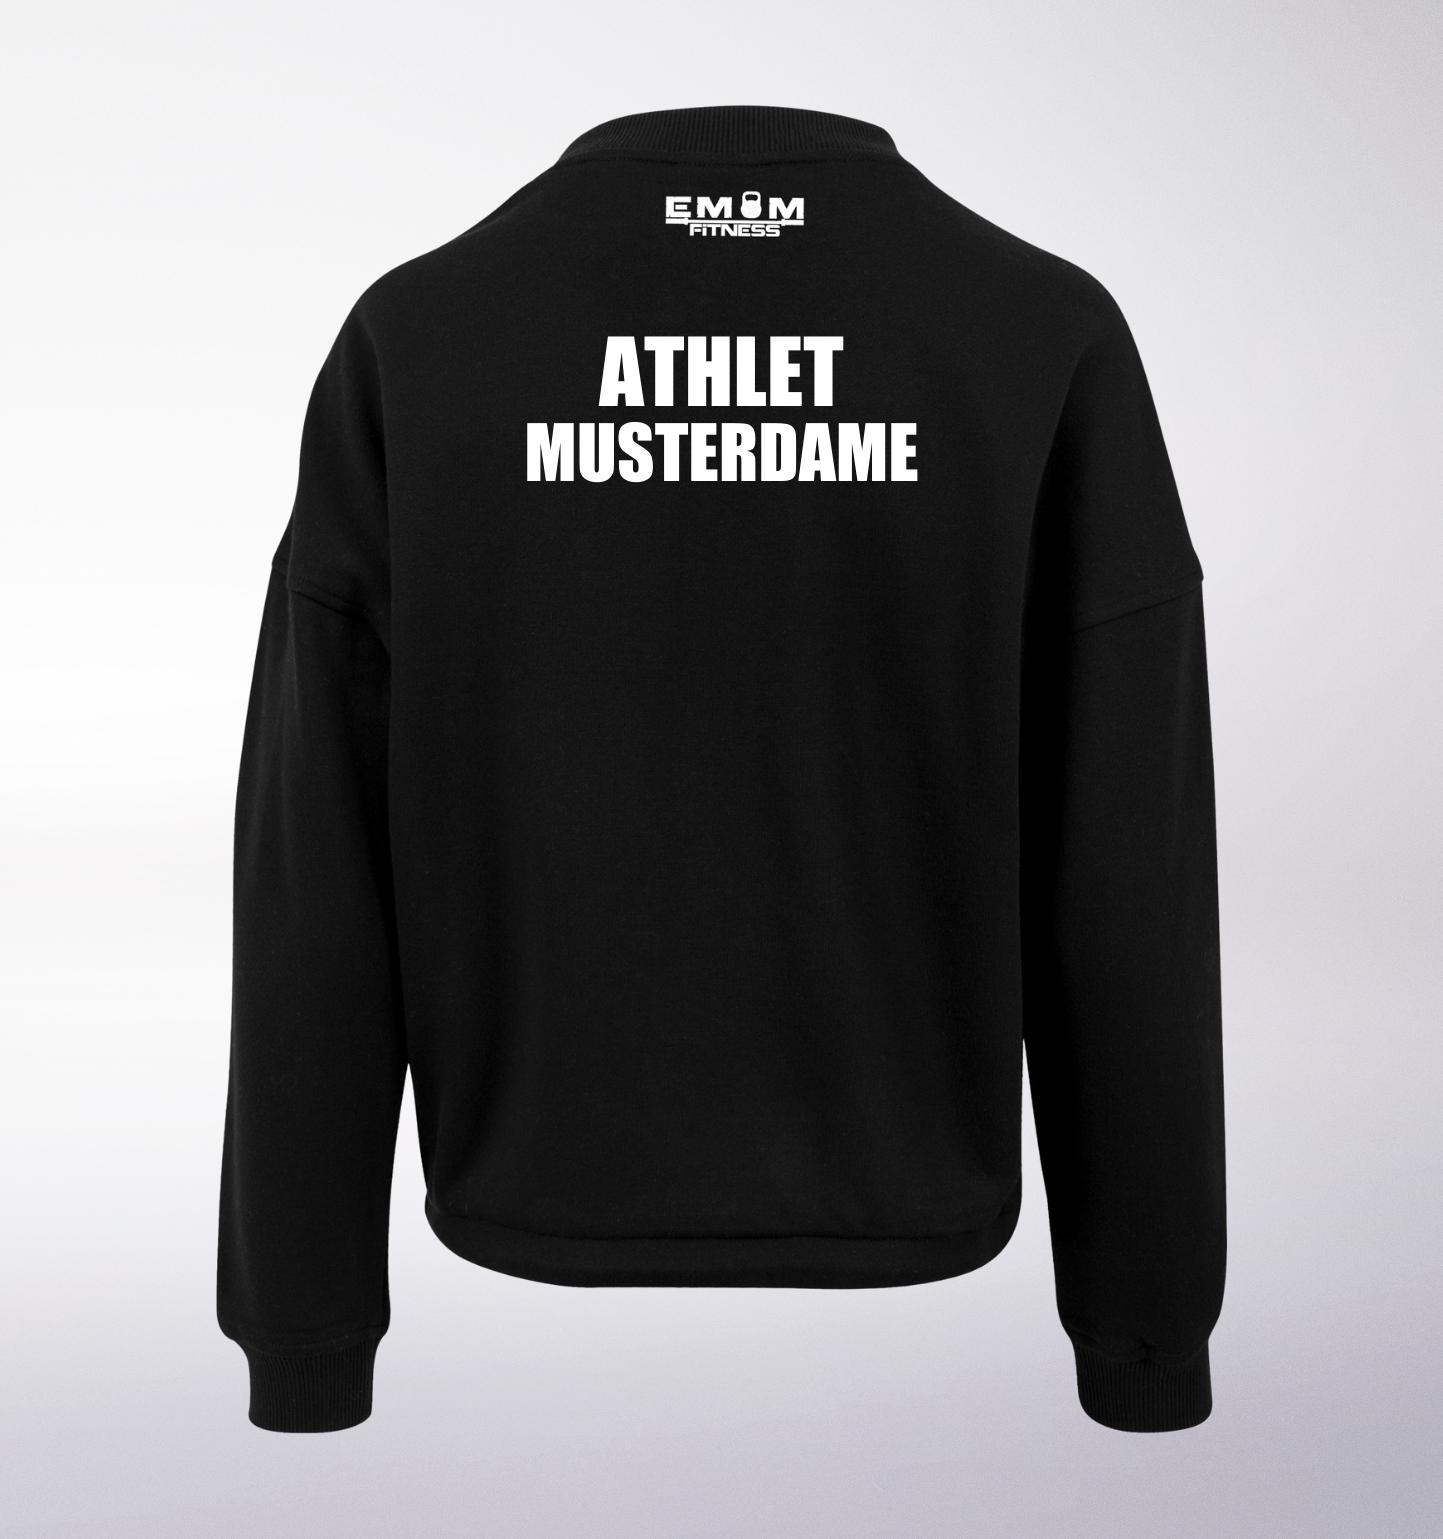 Team COUCH Athleten Oversized Sweater - Damen 14